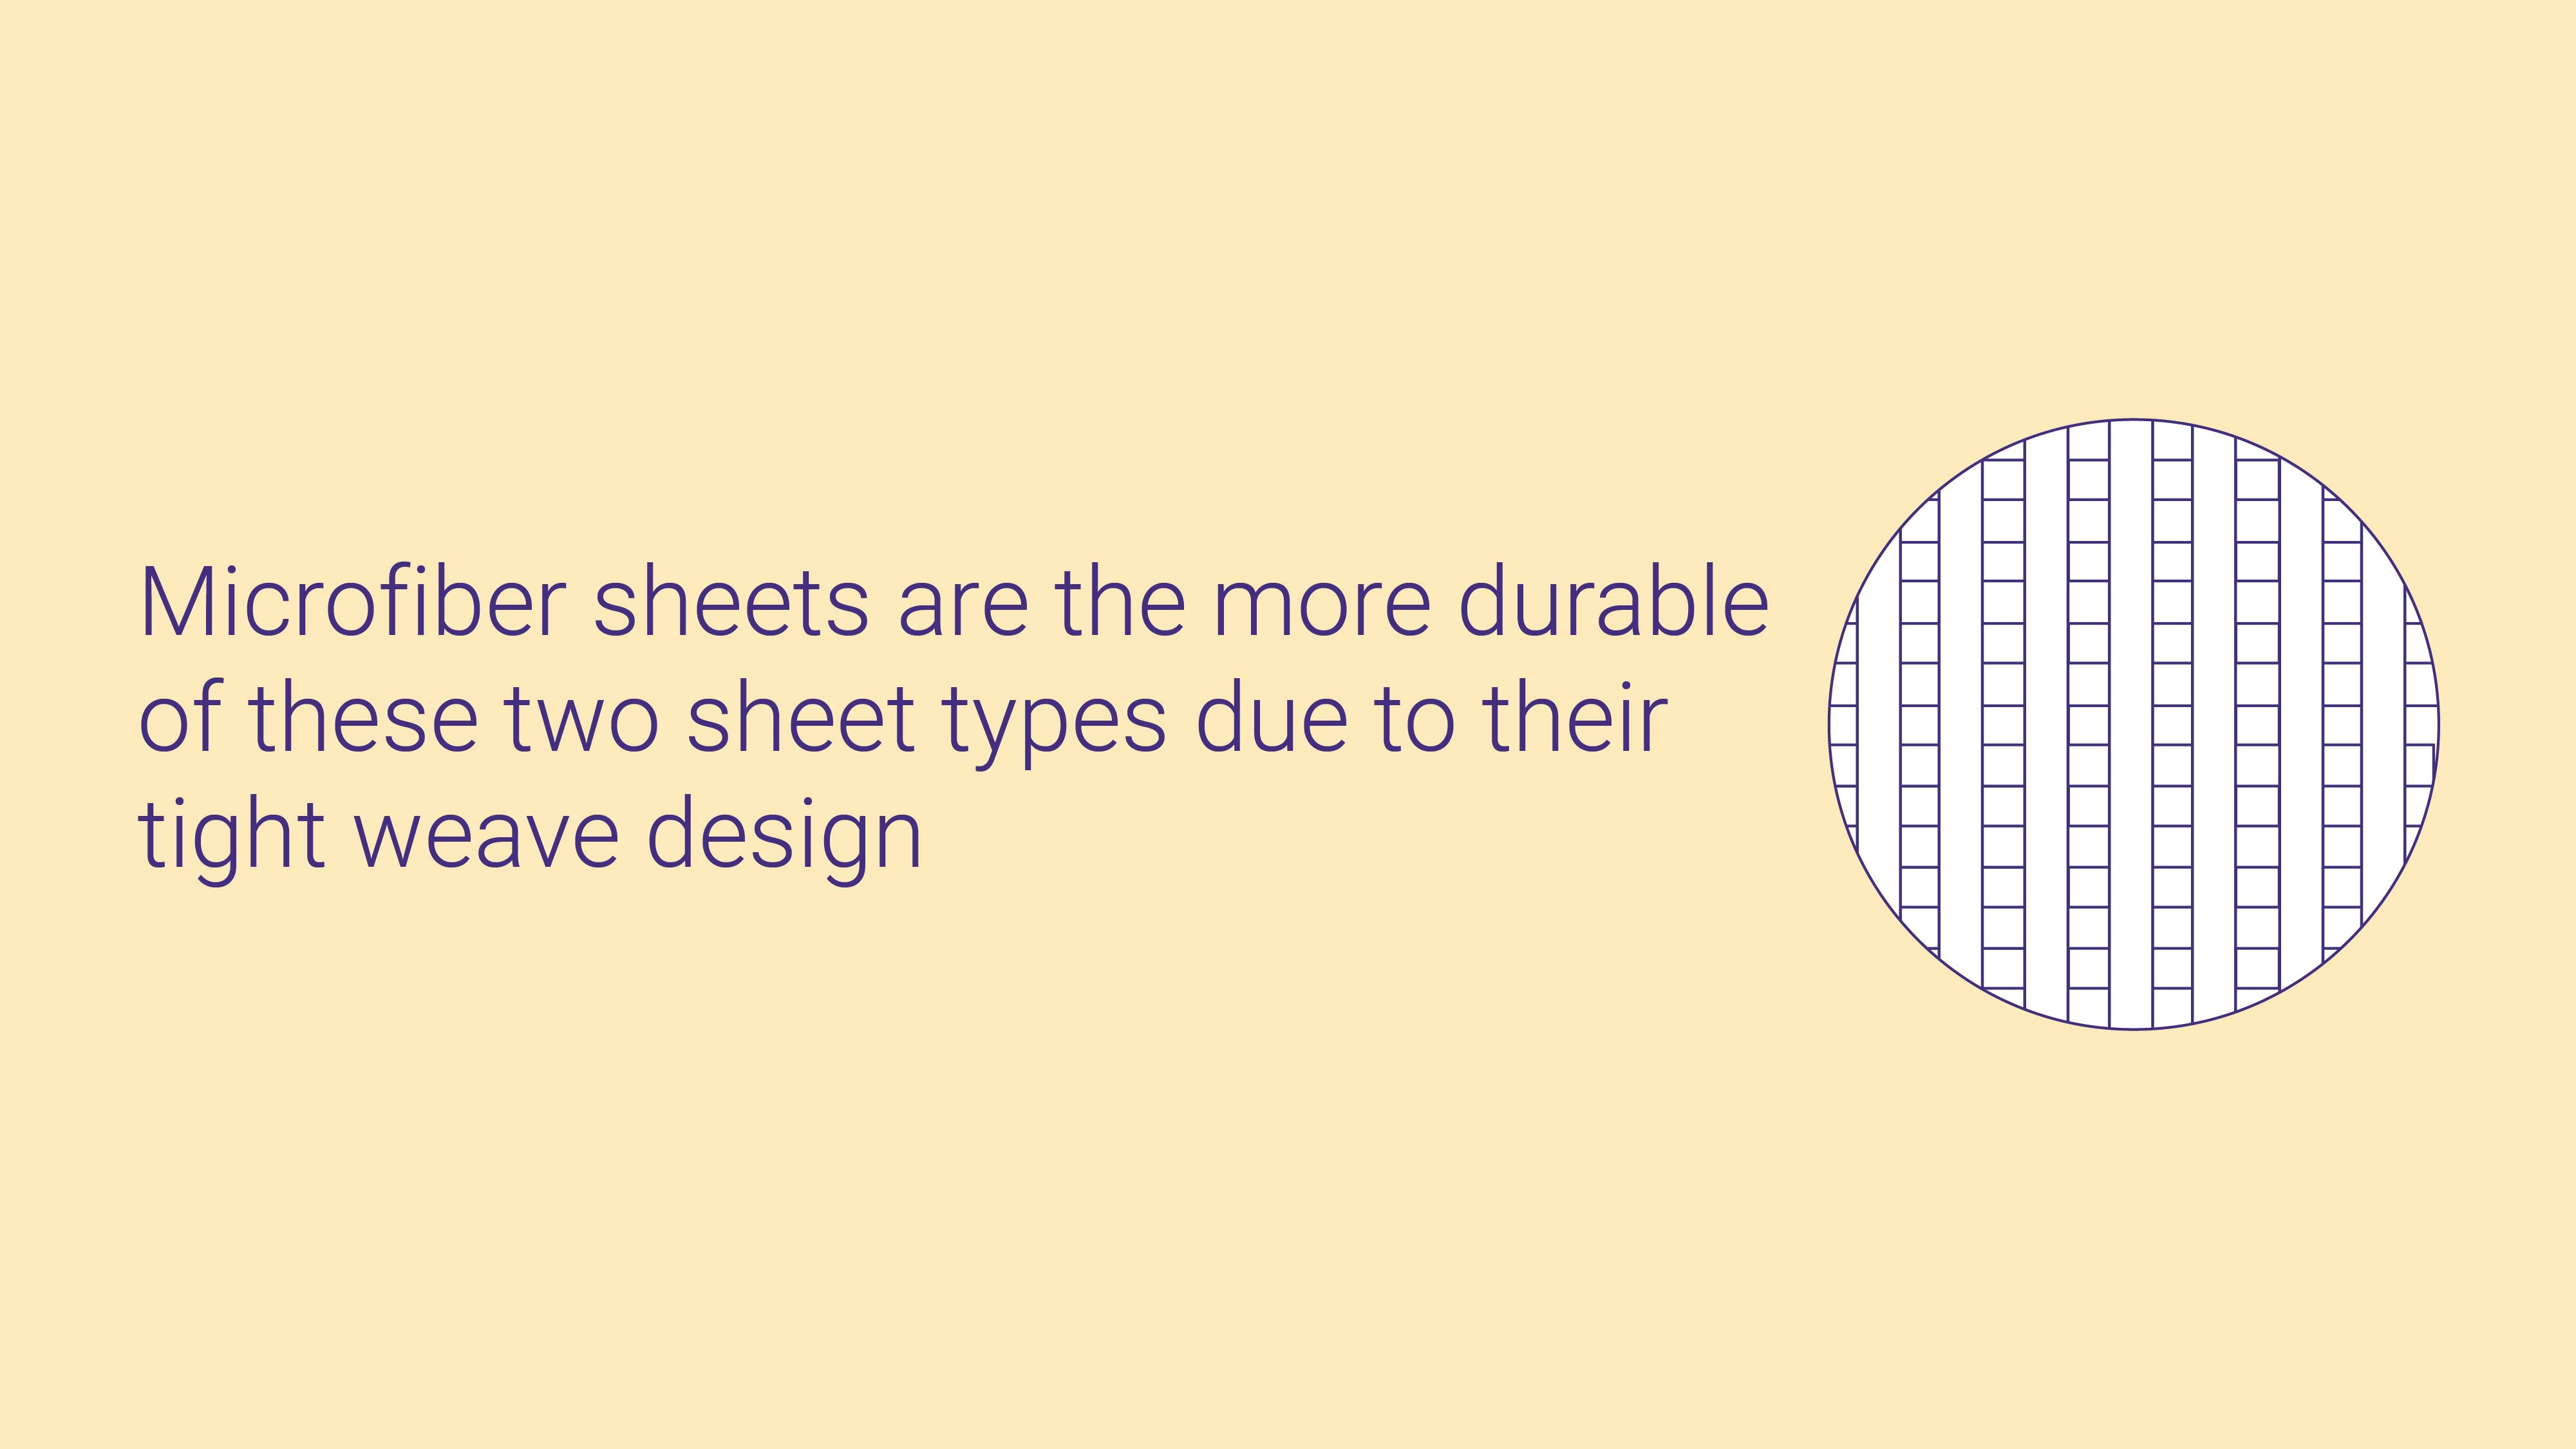 Cotton-vs-Microfiber-Sheets